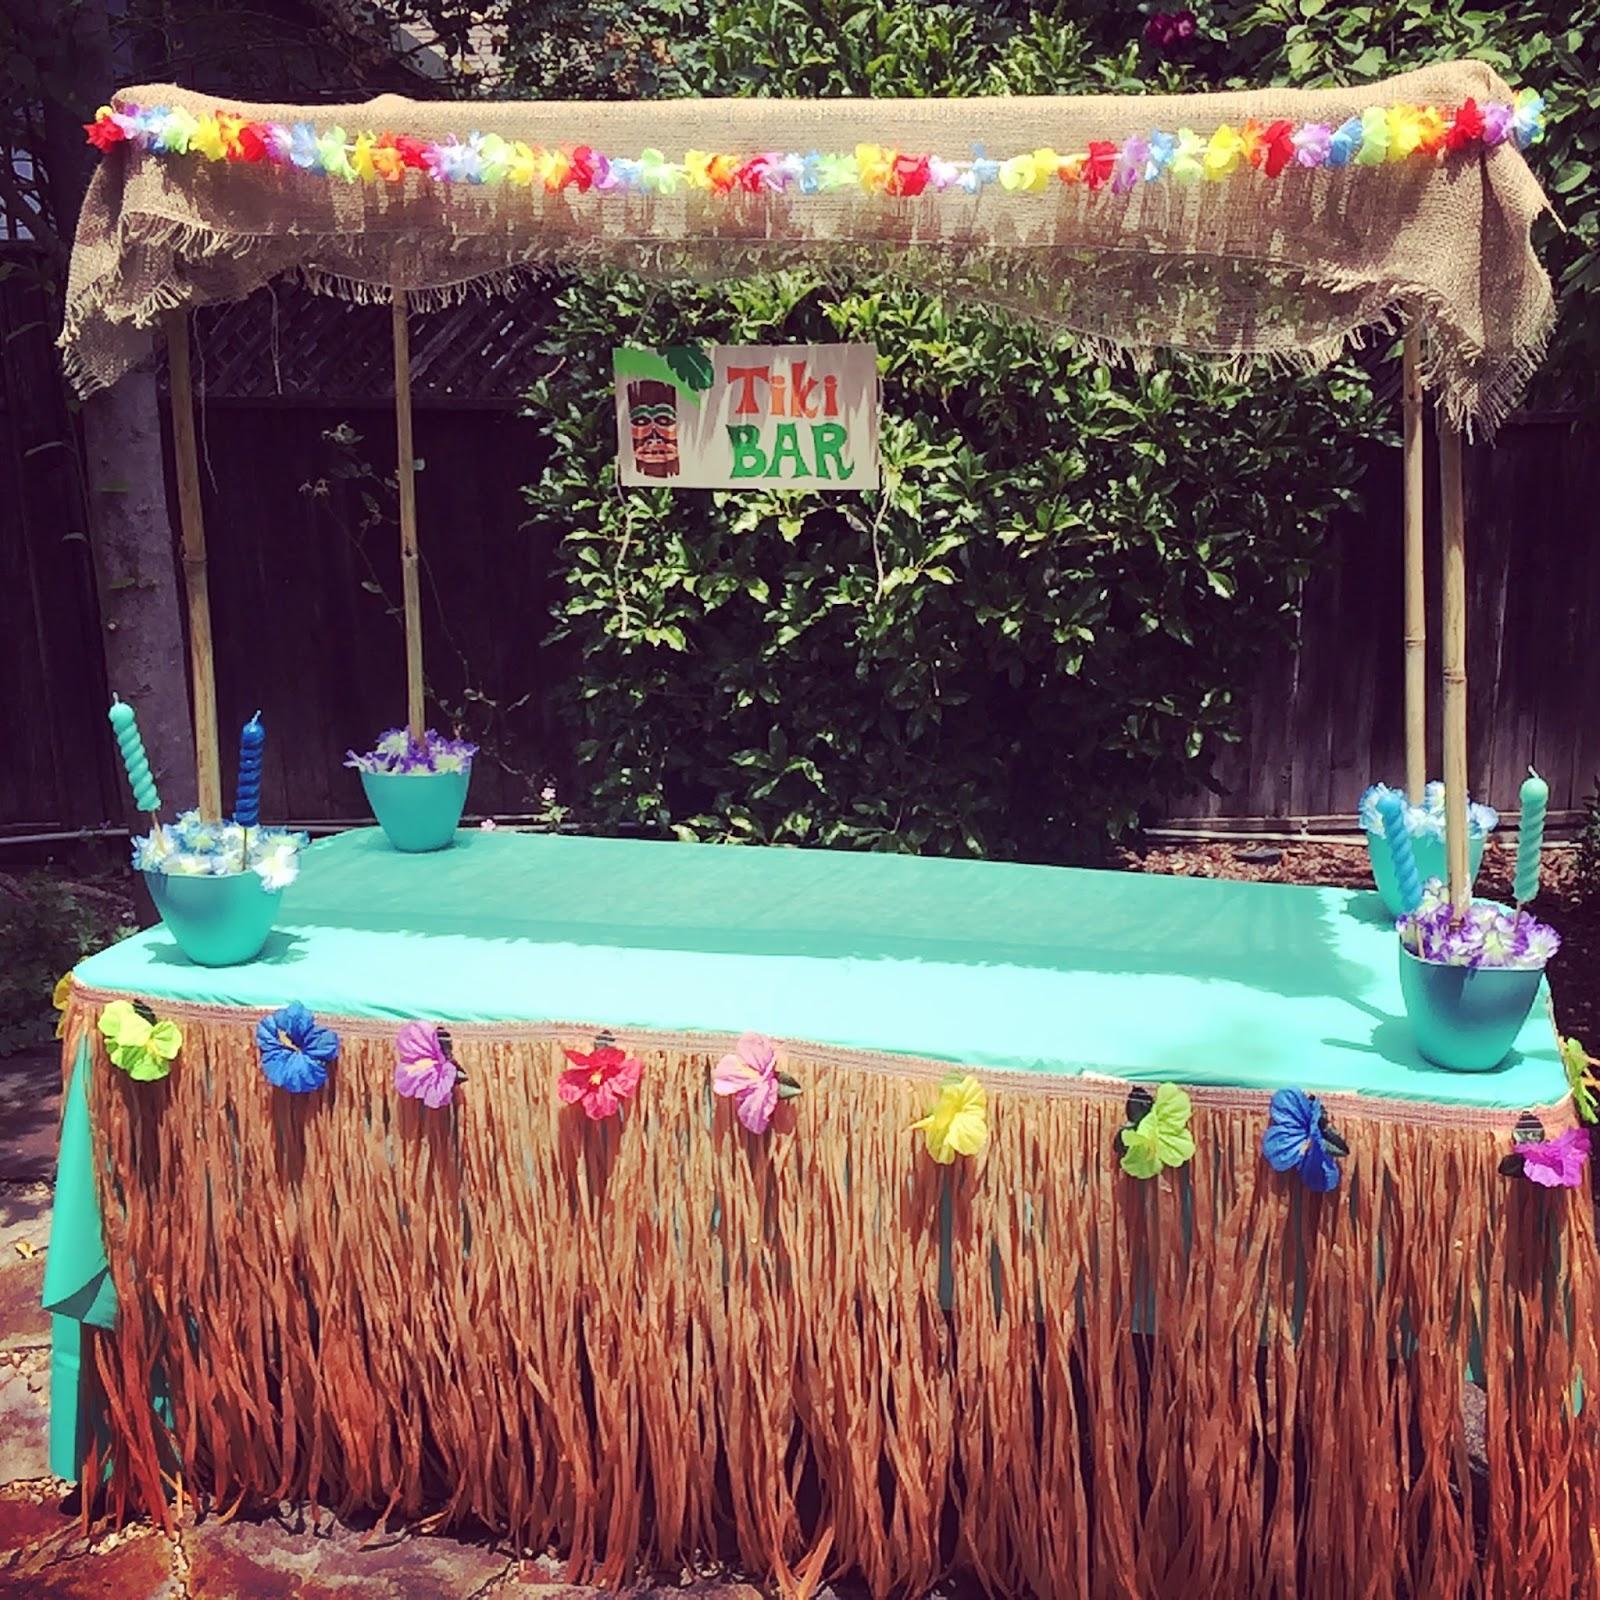 Magnolias and Sunlight: Get Lei'd: The Tiki Birthday Bash!